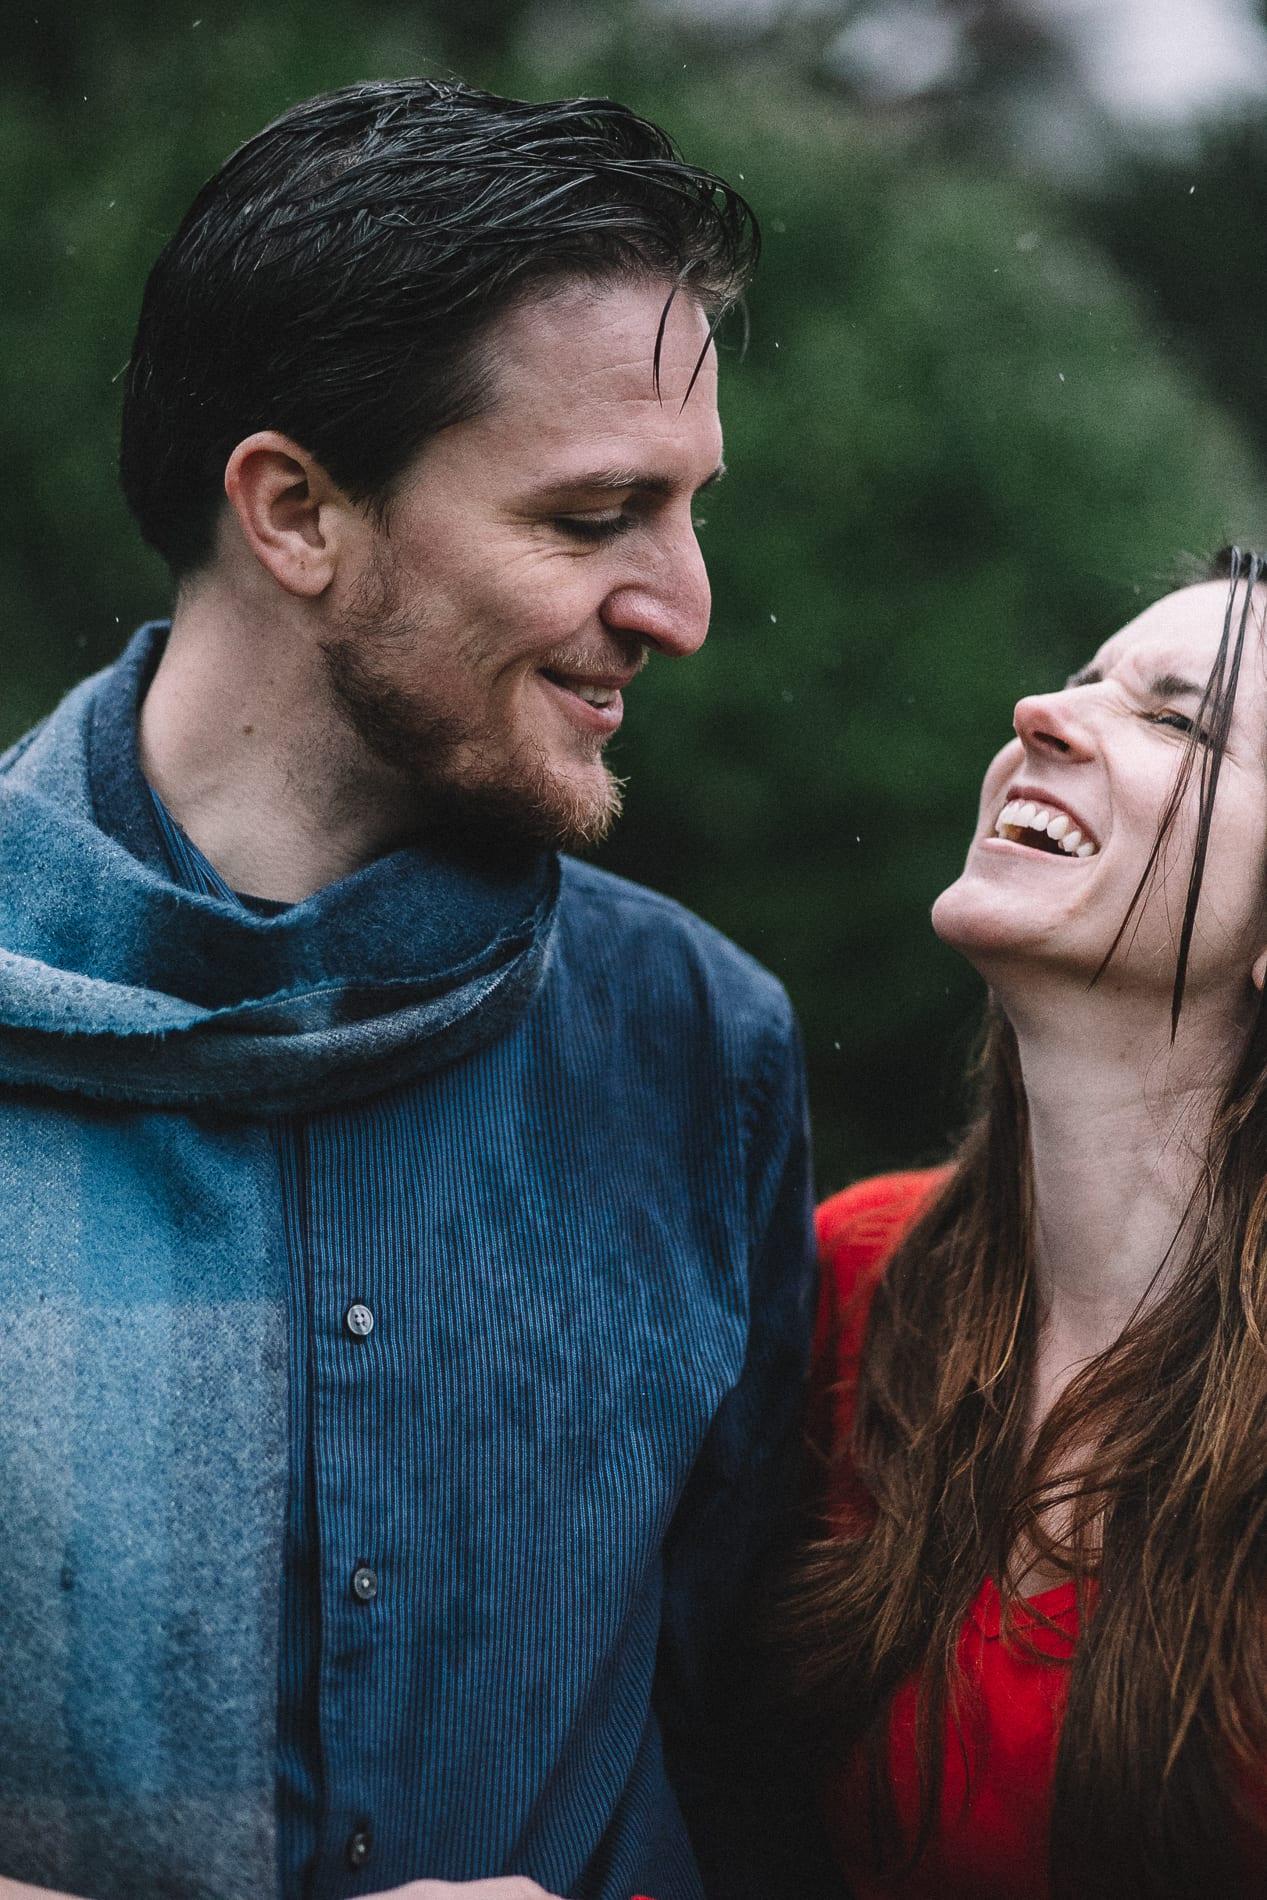 redding-caldwell-lake-park-gazebo-couples-photo-11